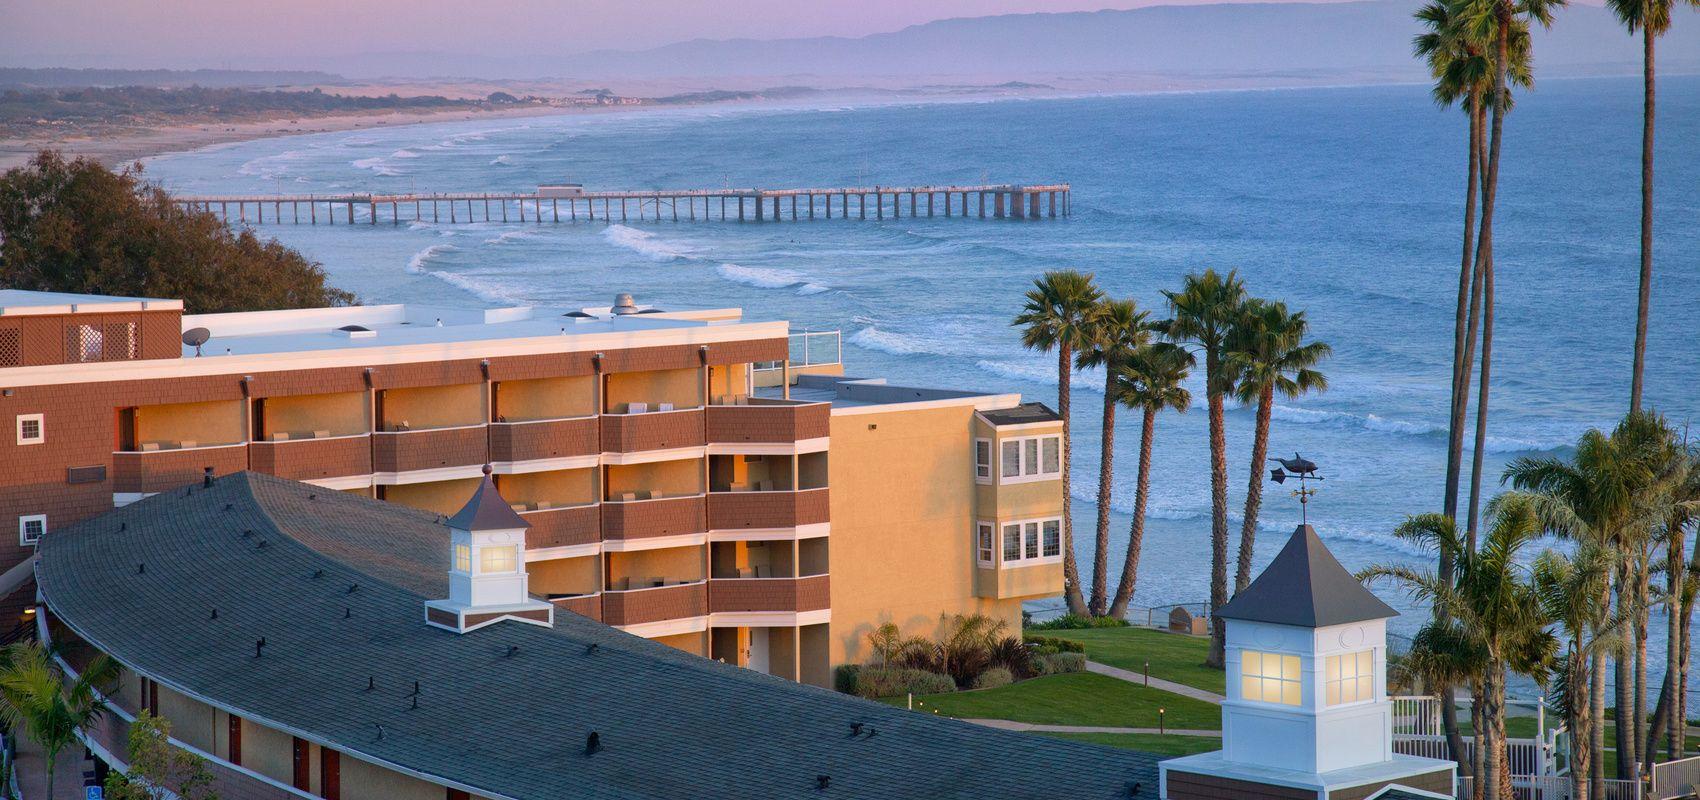 Hotel In Pismo Beach Seacrest Oceanfront Ca